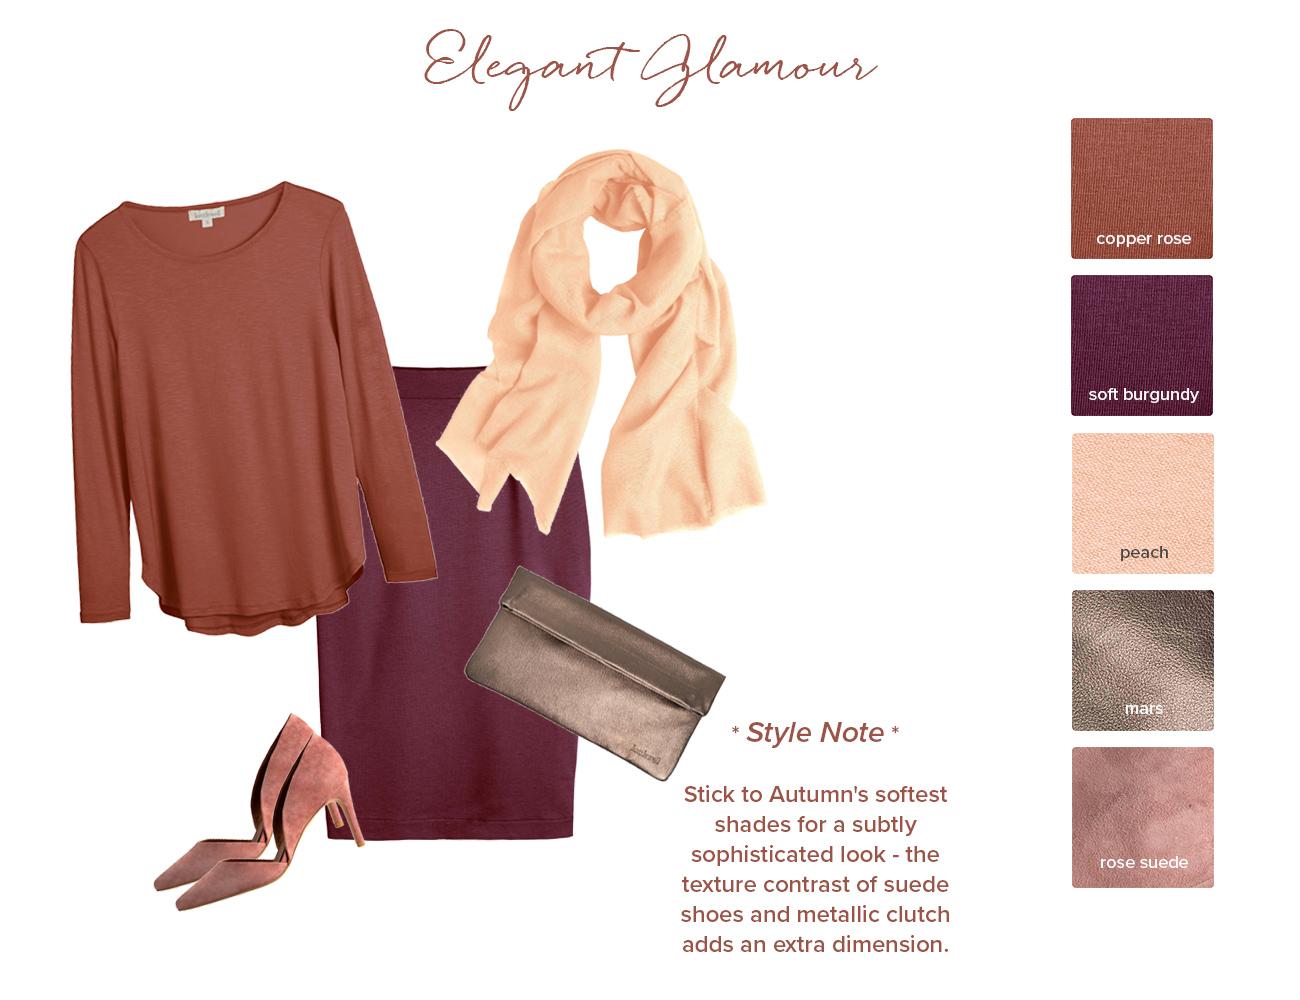 raw-elegant_glamour.jpg